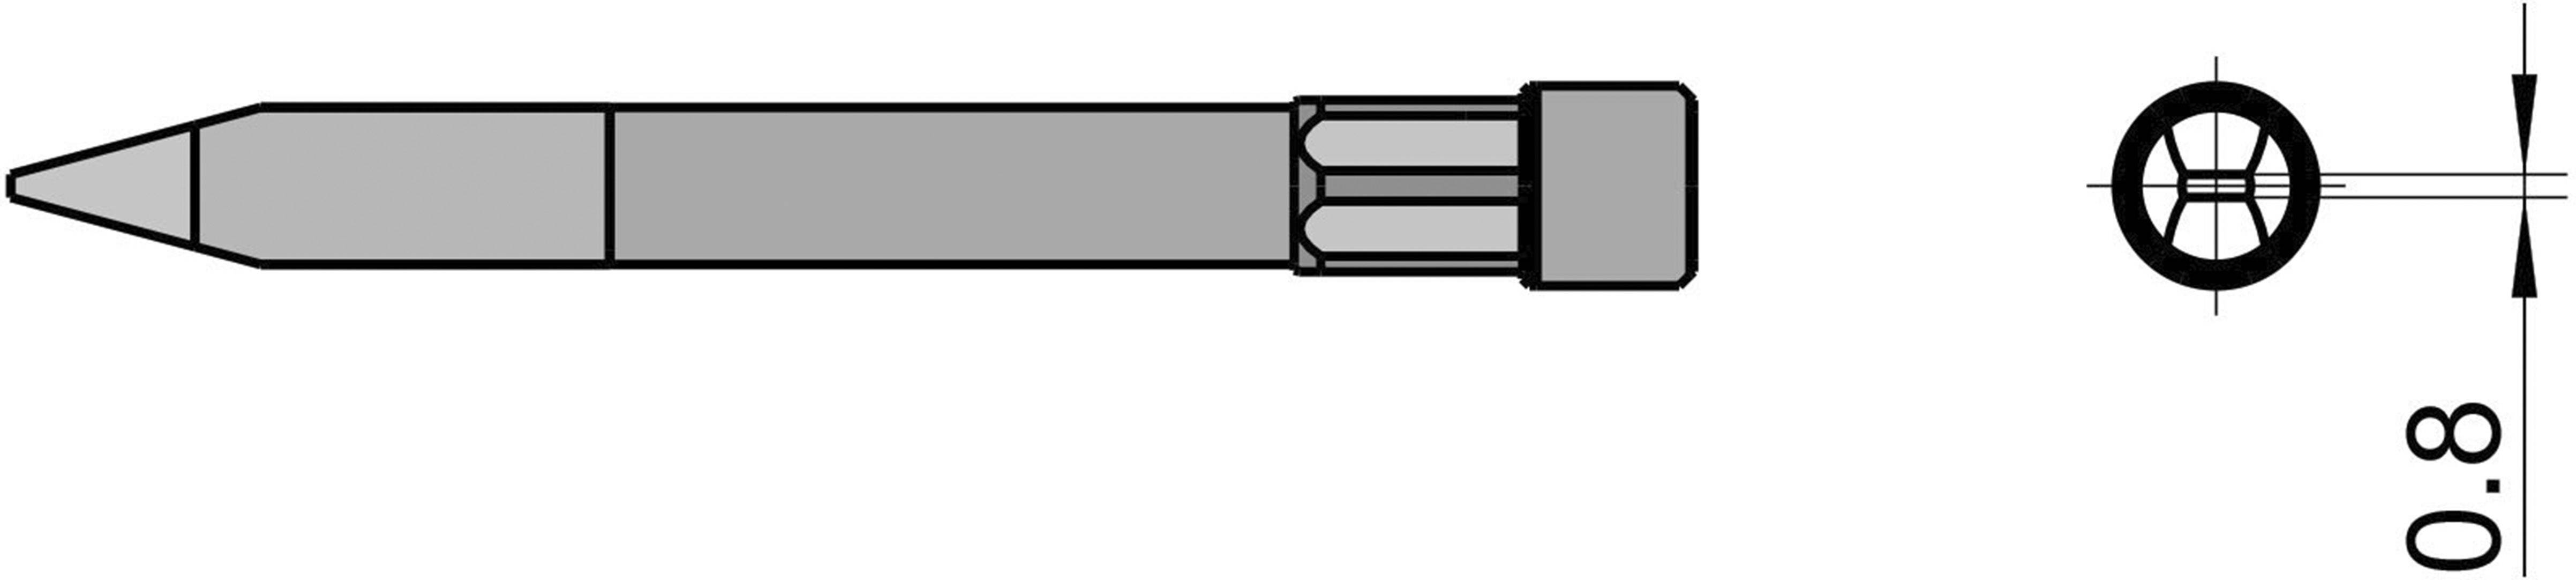 Spájkovací hrot dlátová forma Weller Professional T0054490599, velikost hrotu 0.8 mm, délka hrotu 59 mm, 1 ks